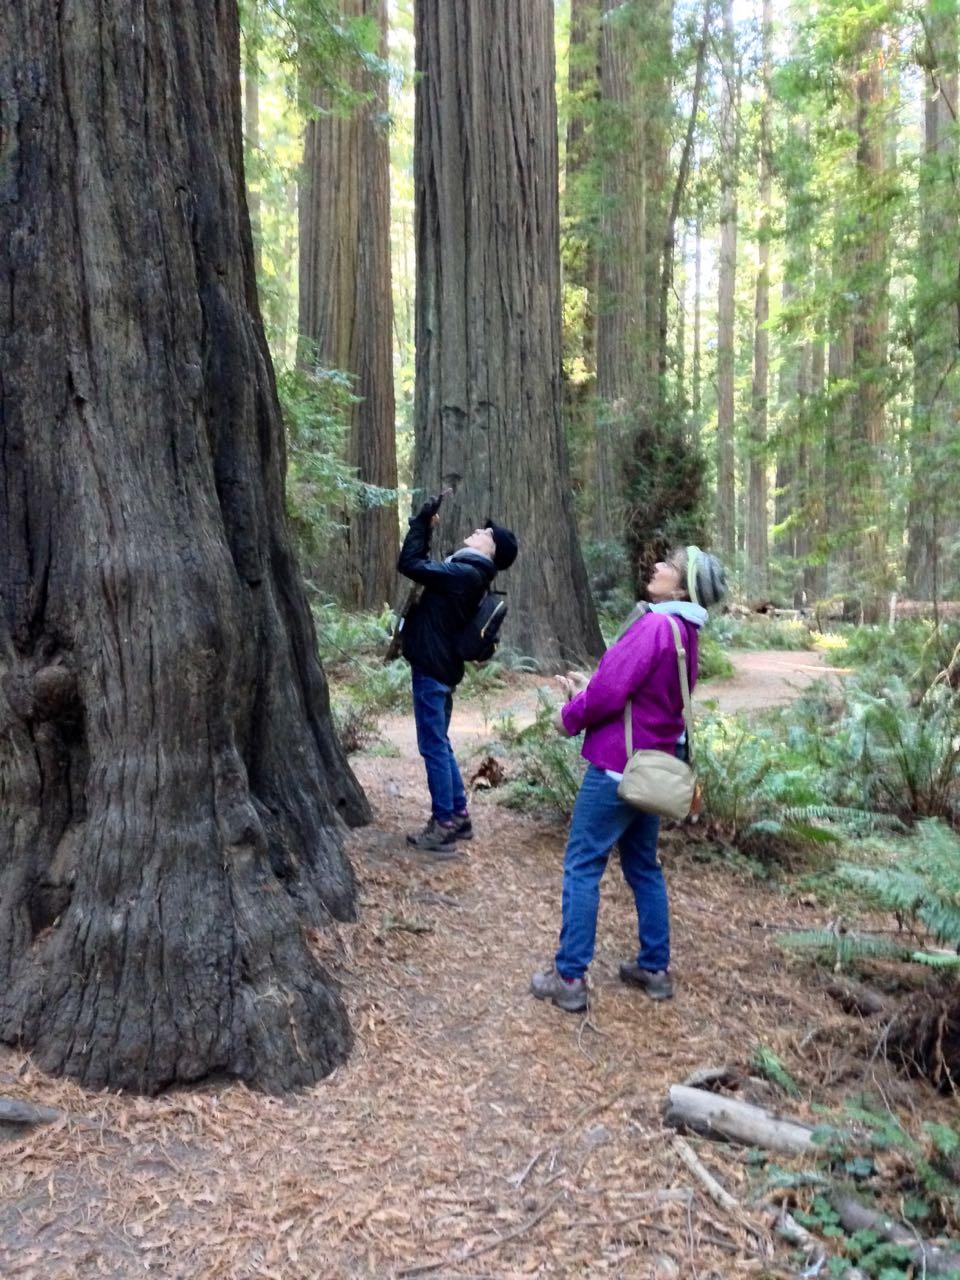 Redwoods 2017 10 08 18 Of 287